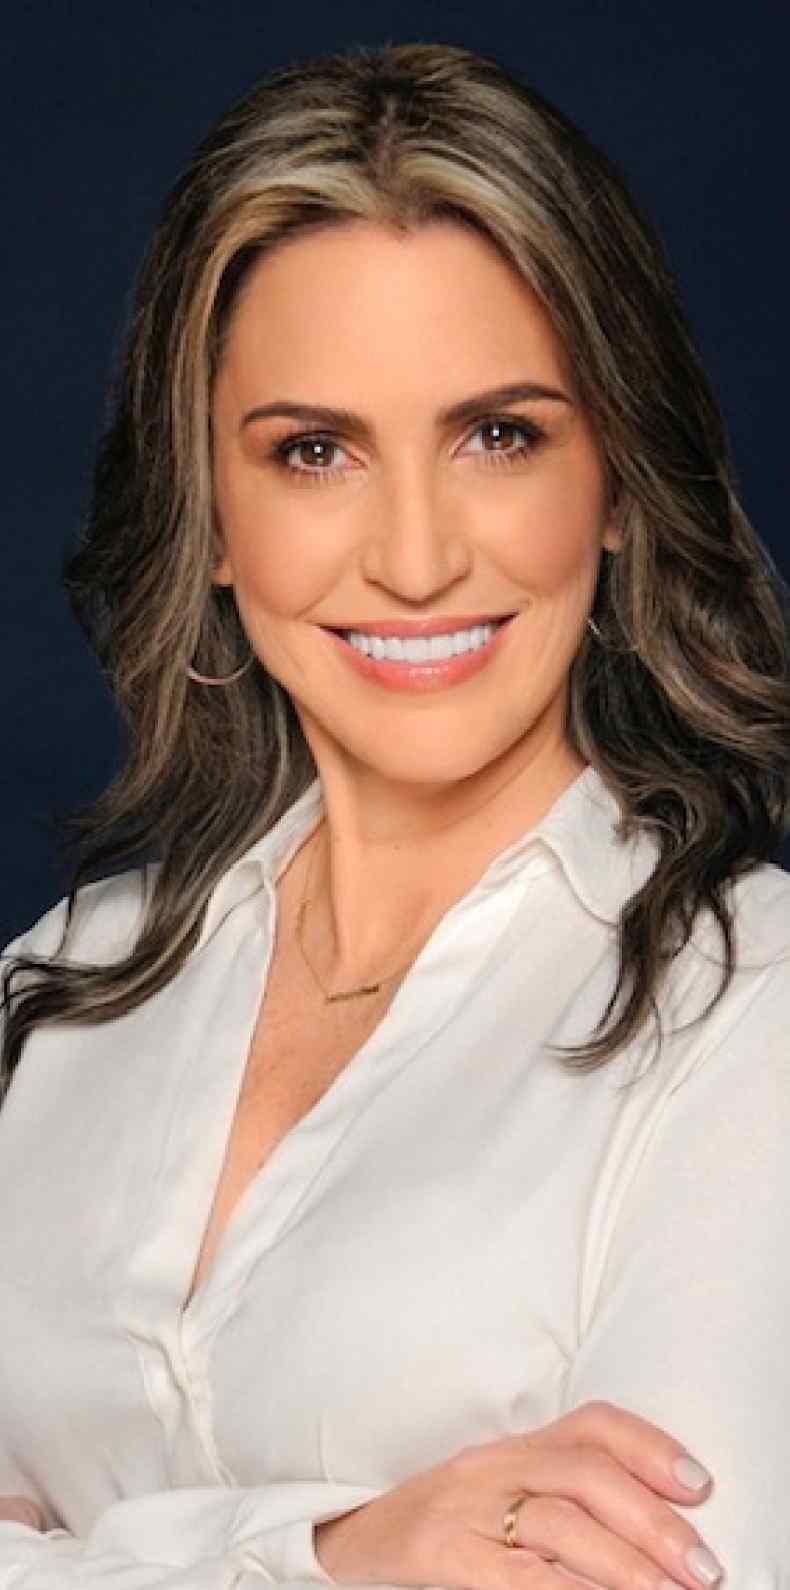 Michelle Goñi MD